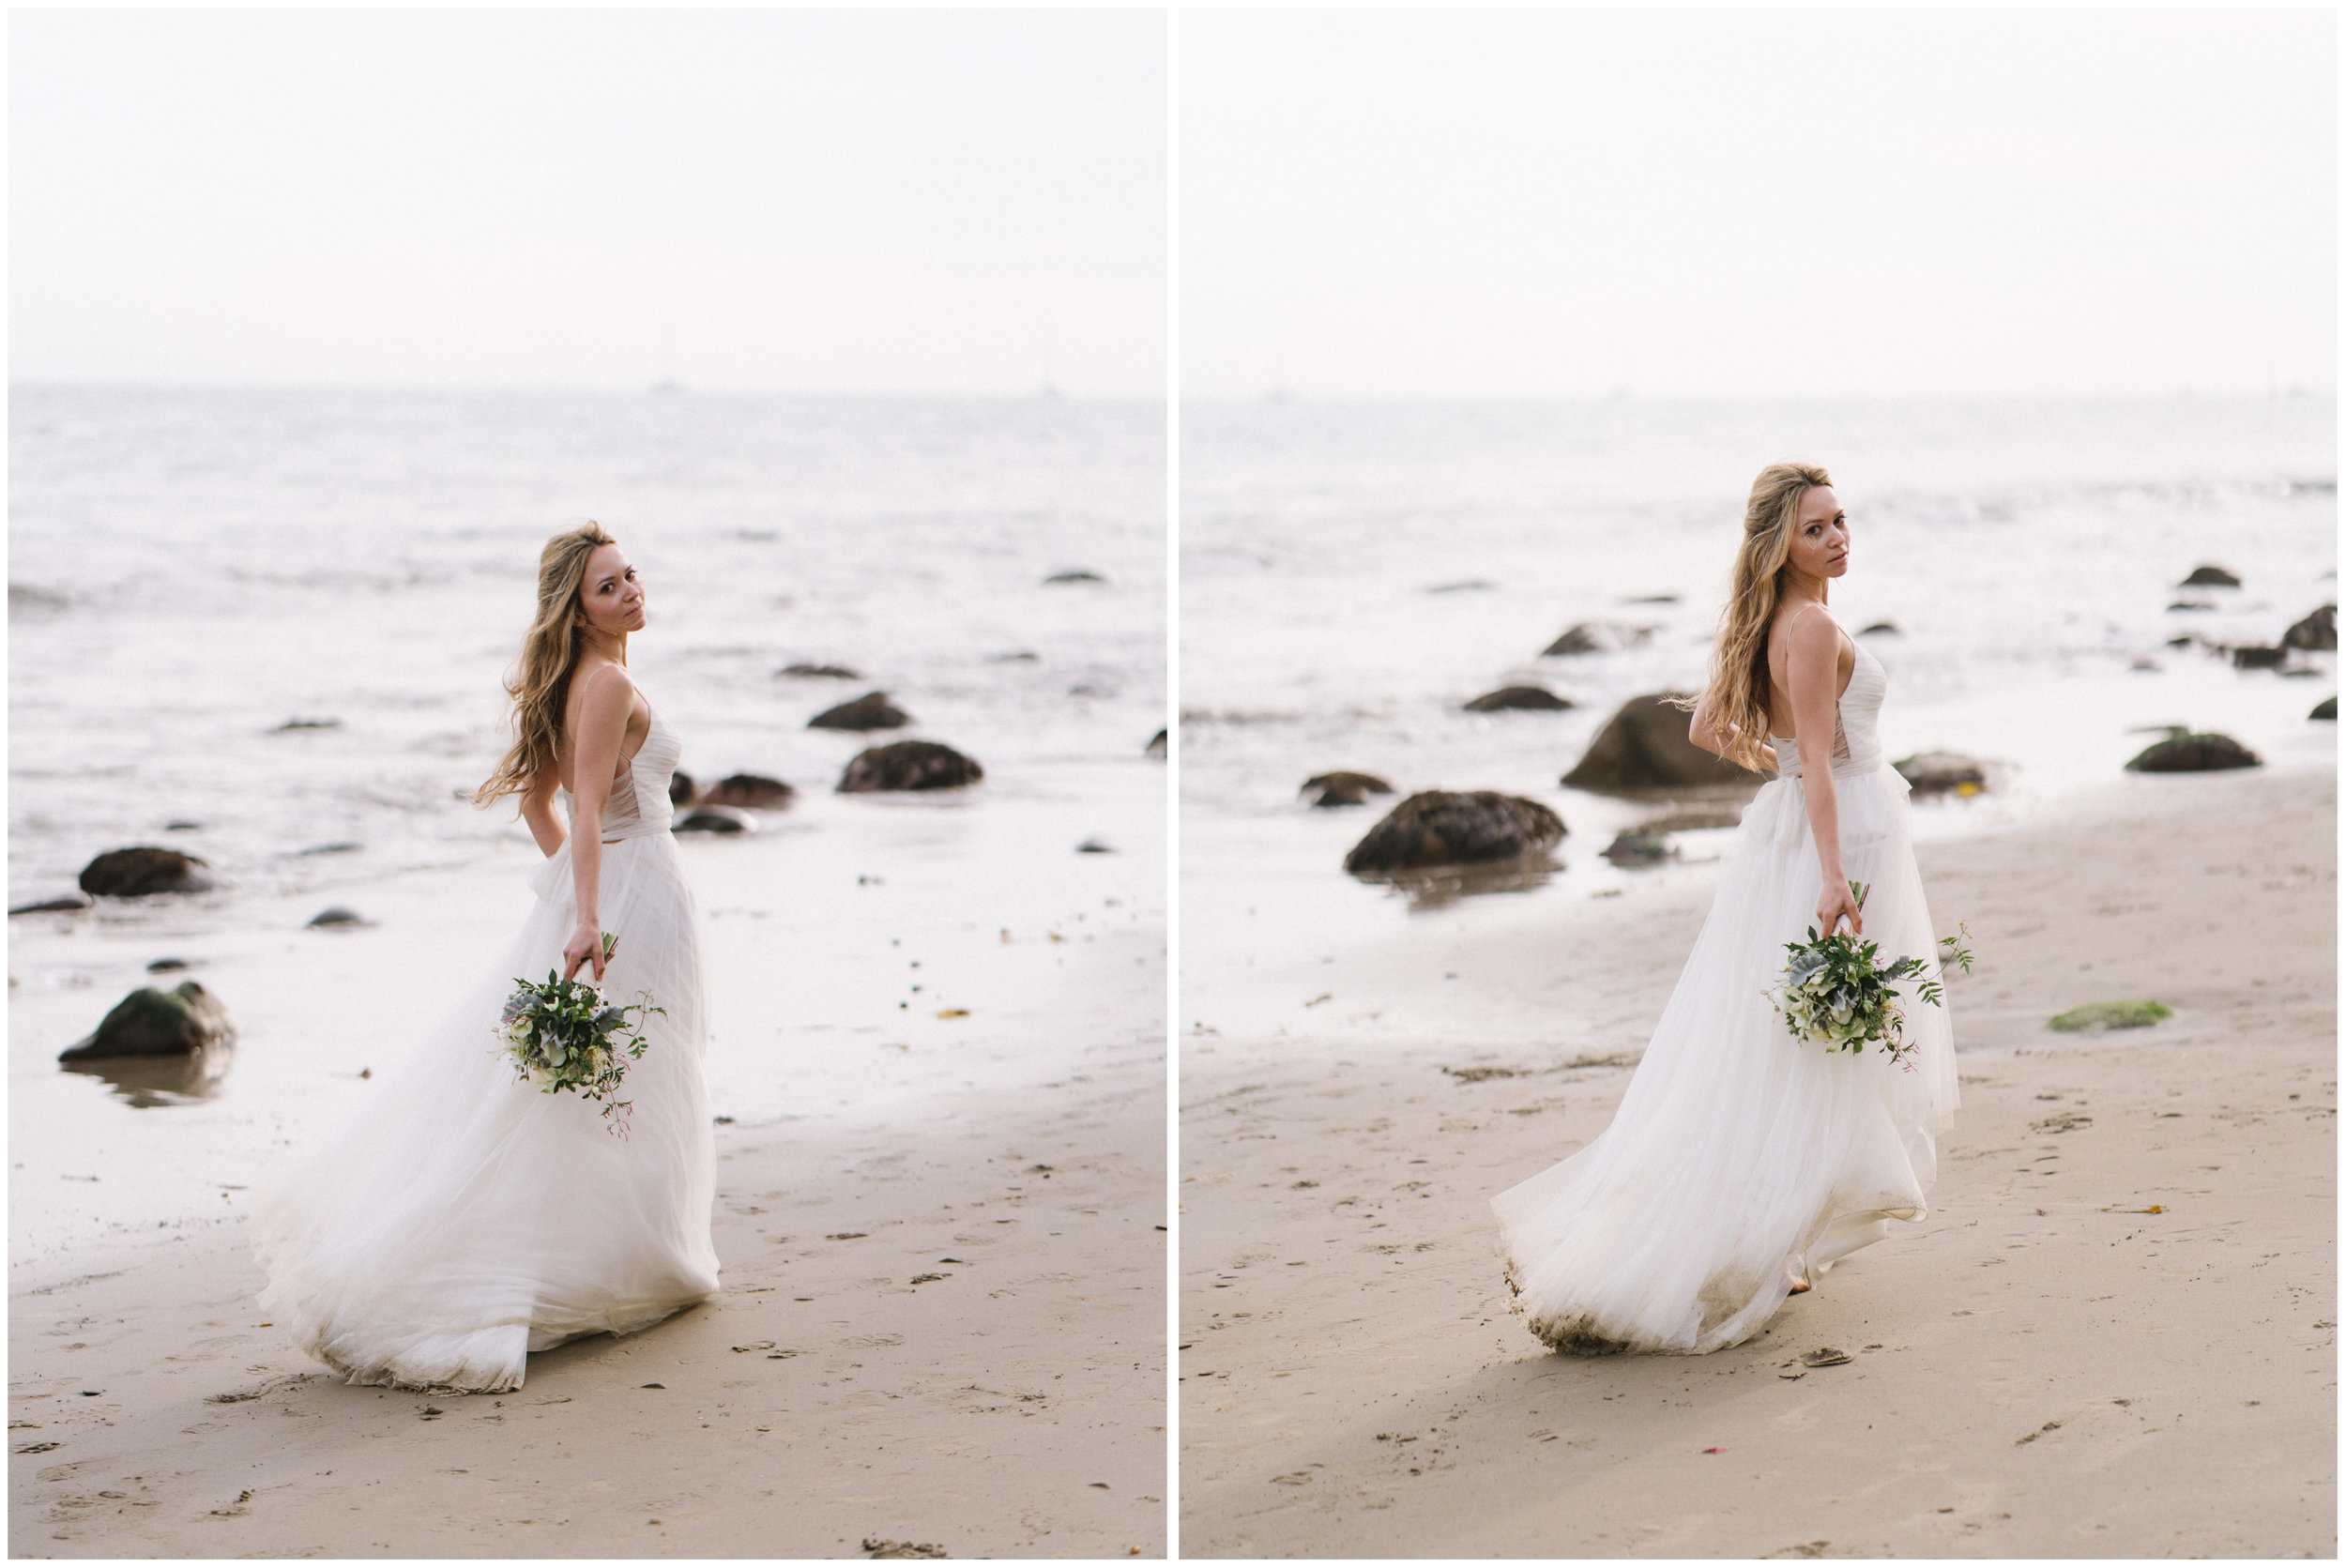 Santa Barbara Elopement Wedding Photographer - Pinnel Photography-12.jpg